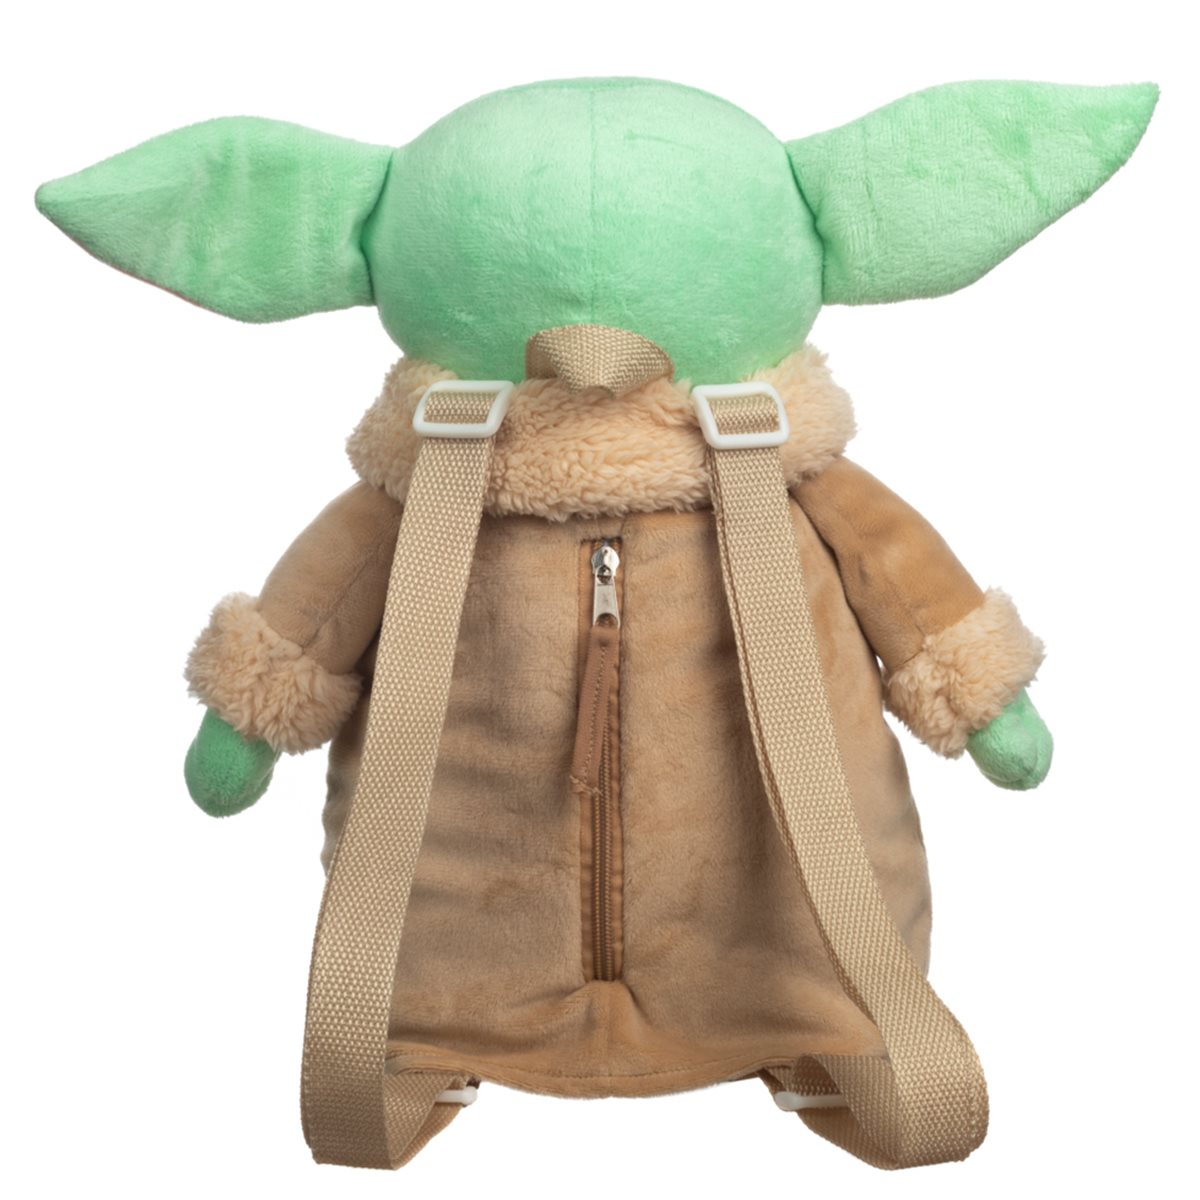 Star Wars The Child Baby Yoda Head Shaped Plush Backpack 14-16